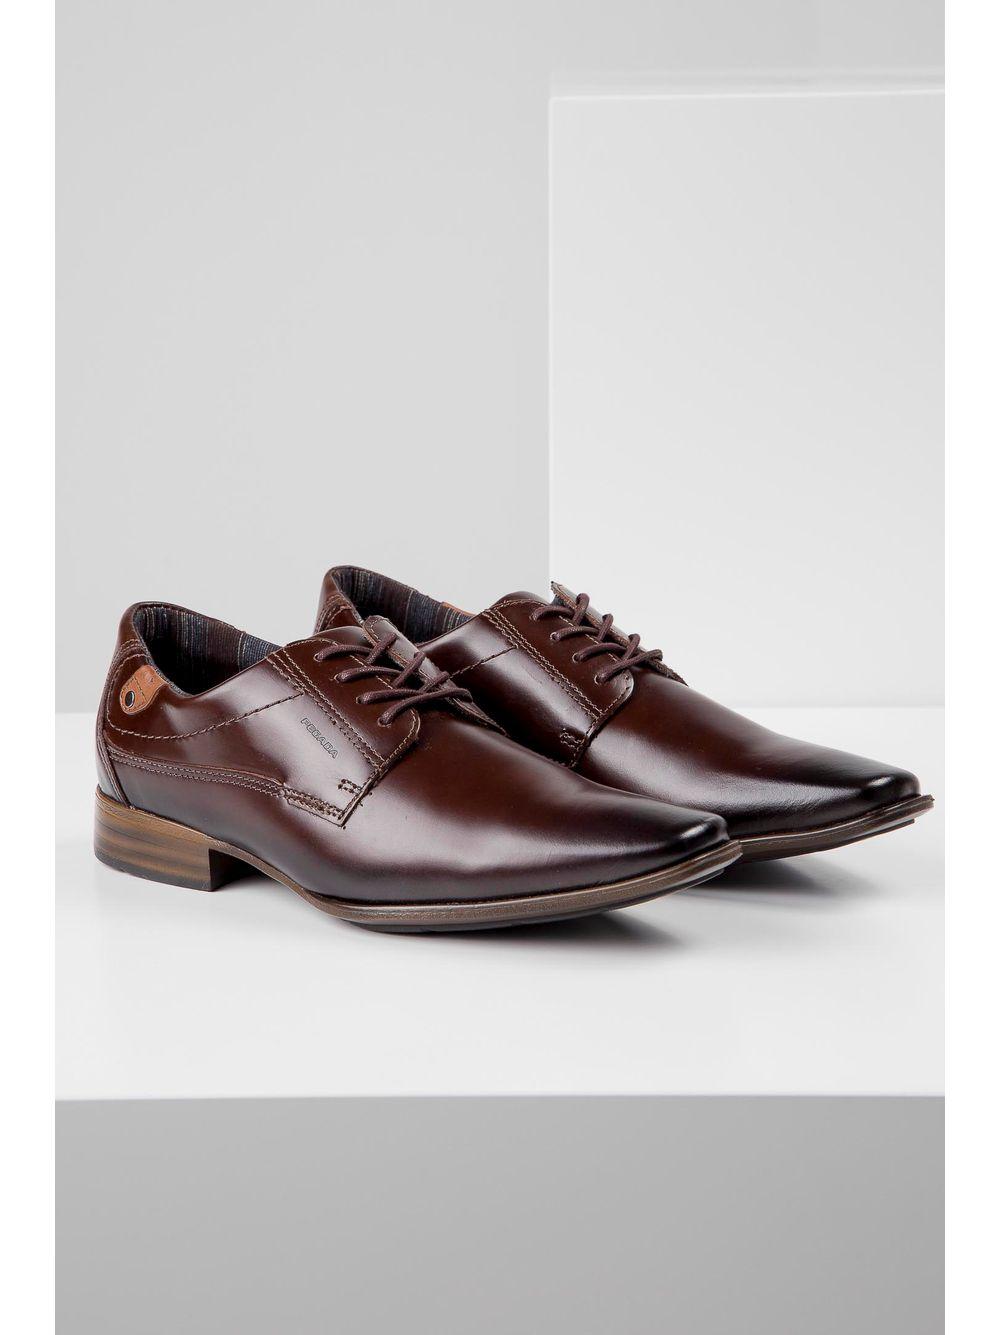 fc68b1accd1 Sapato Pegada Social Cadarço Preto - pittol